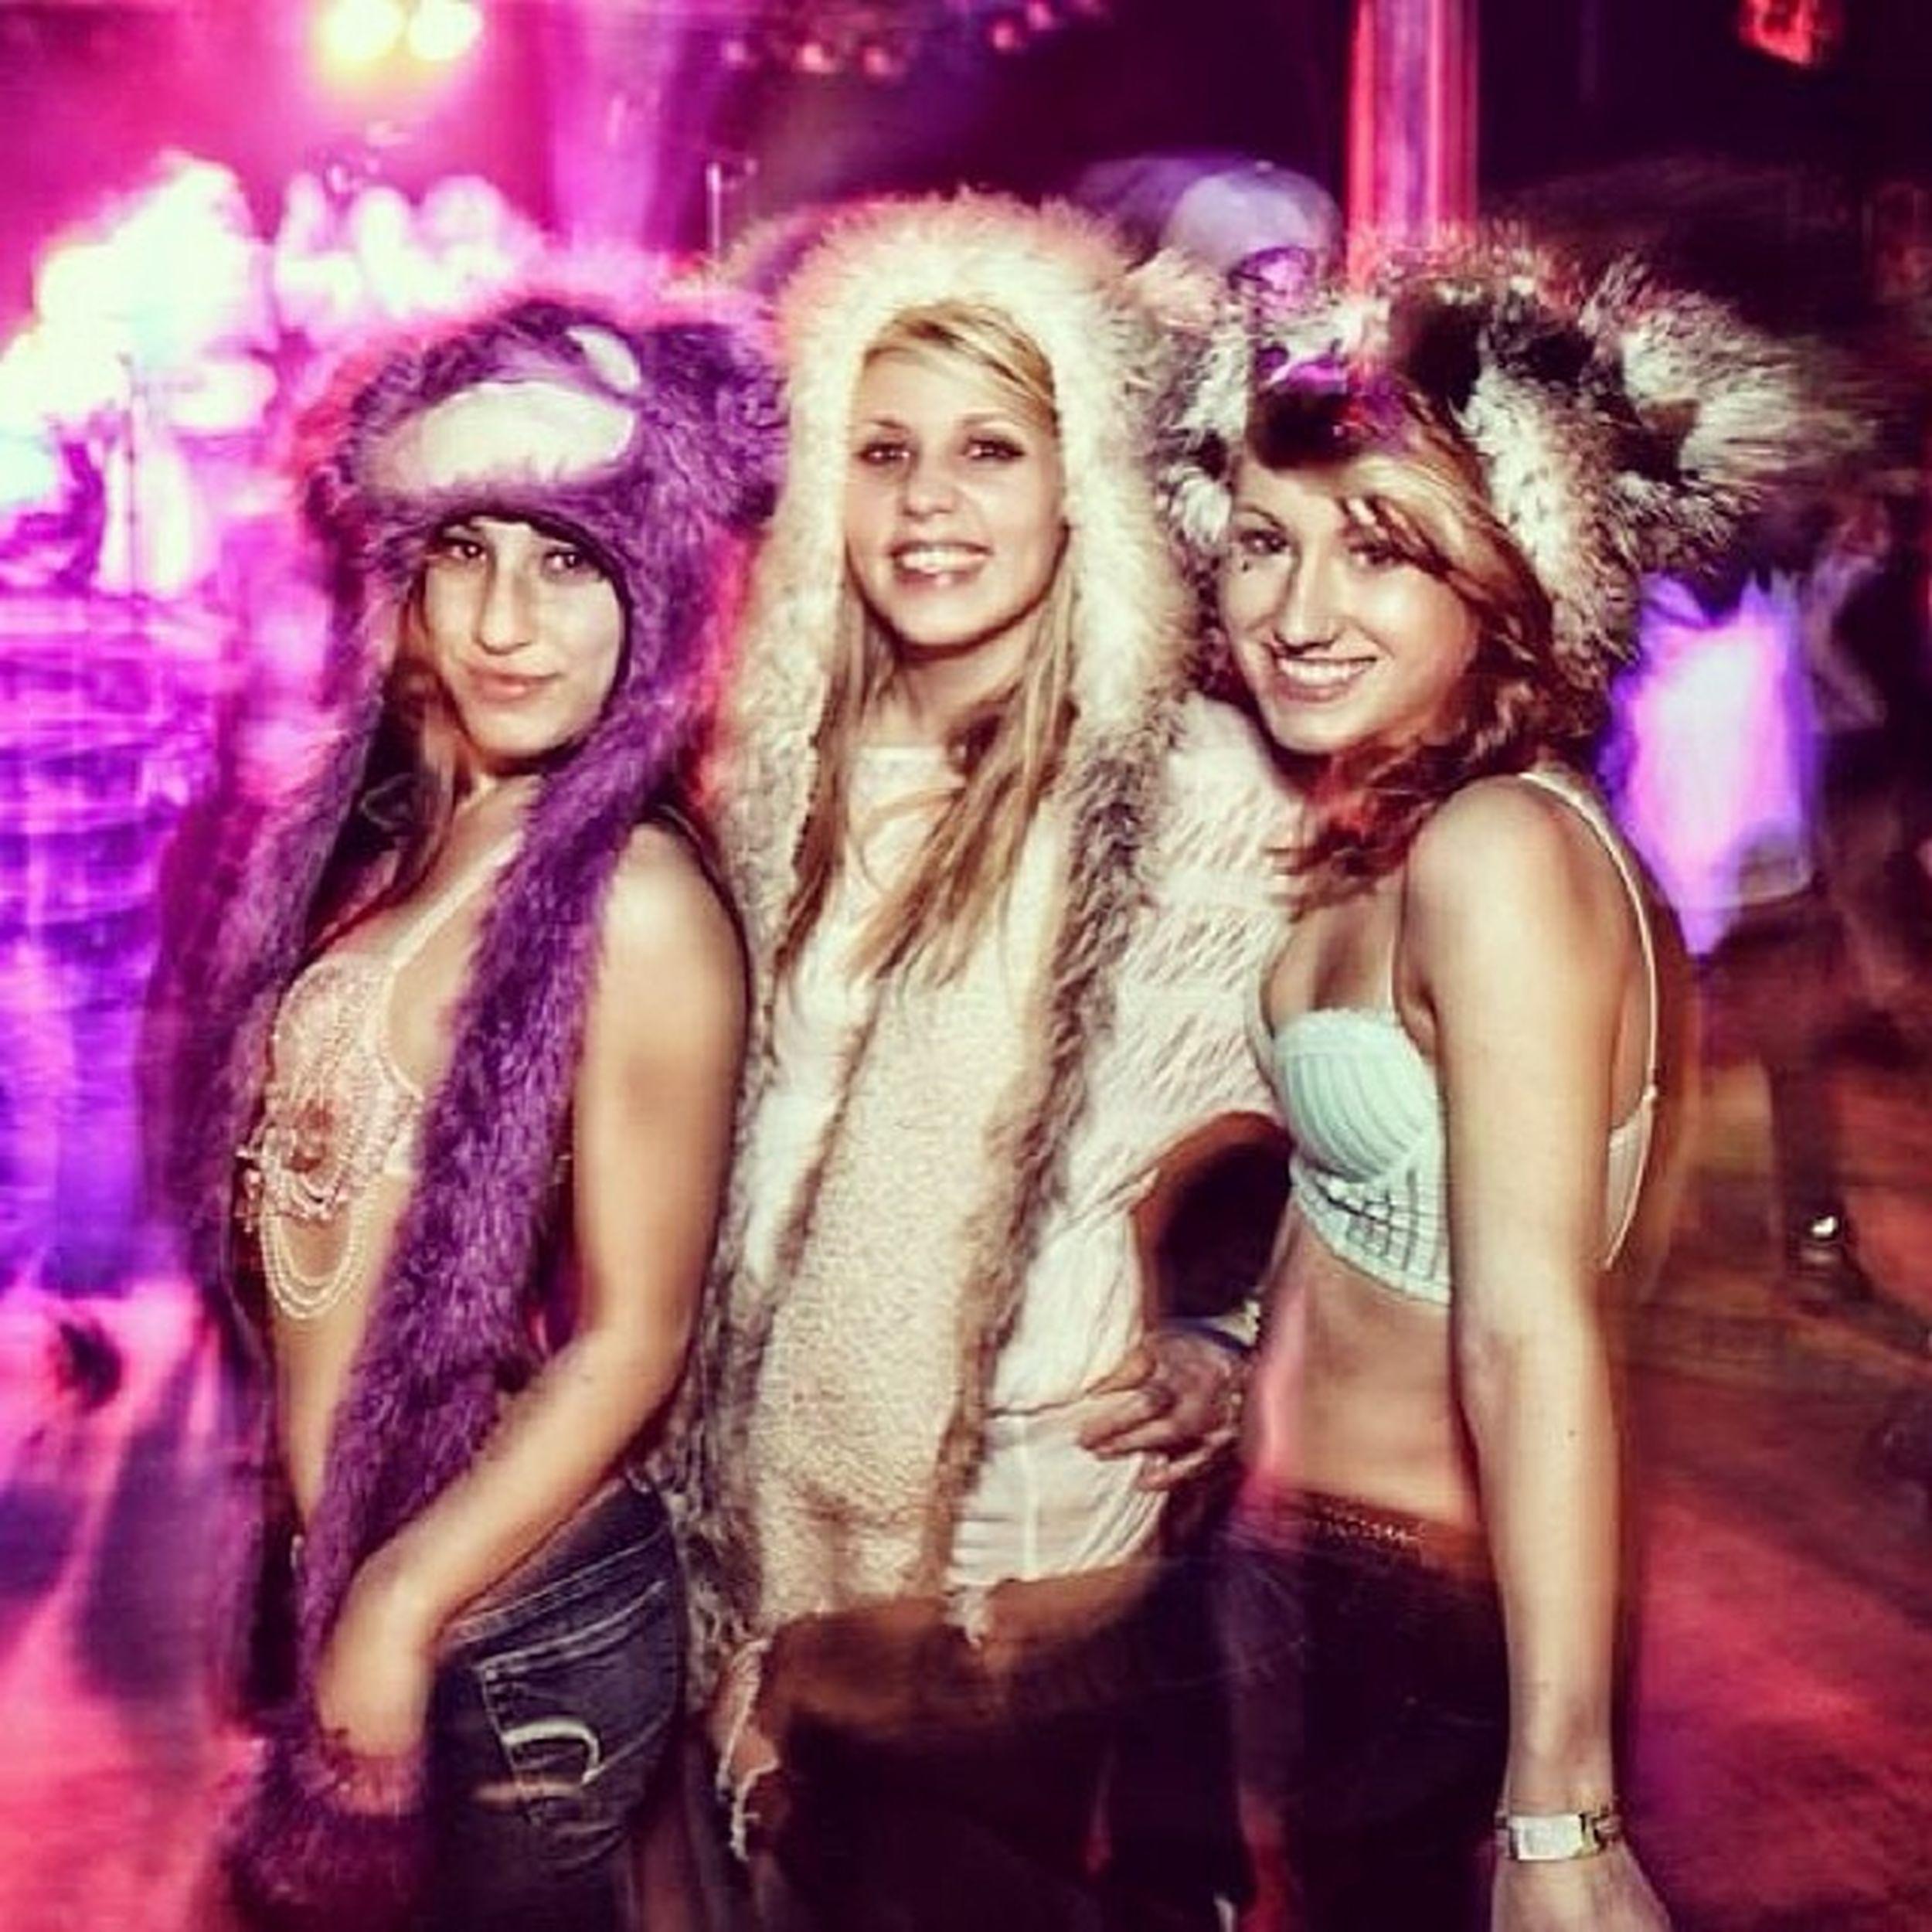 Ravergirls Edm Christmas Winterwonderlandfestival ashlandarmory ashland oregon ??❄️⛄️???